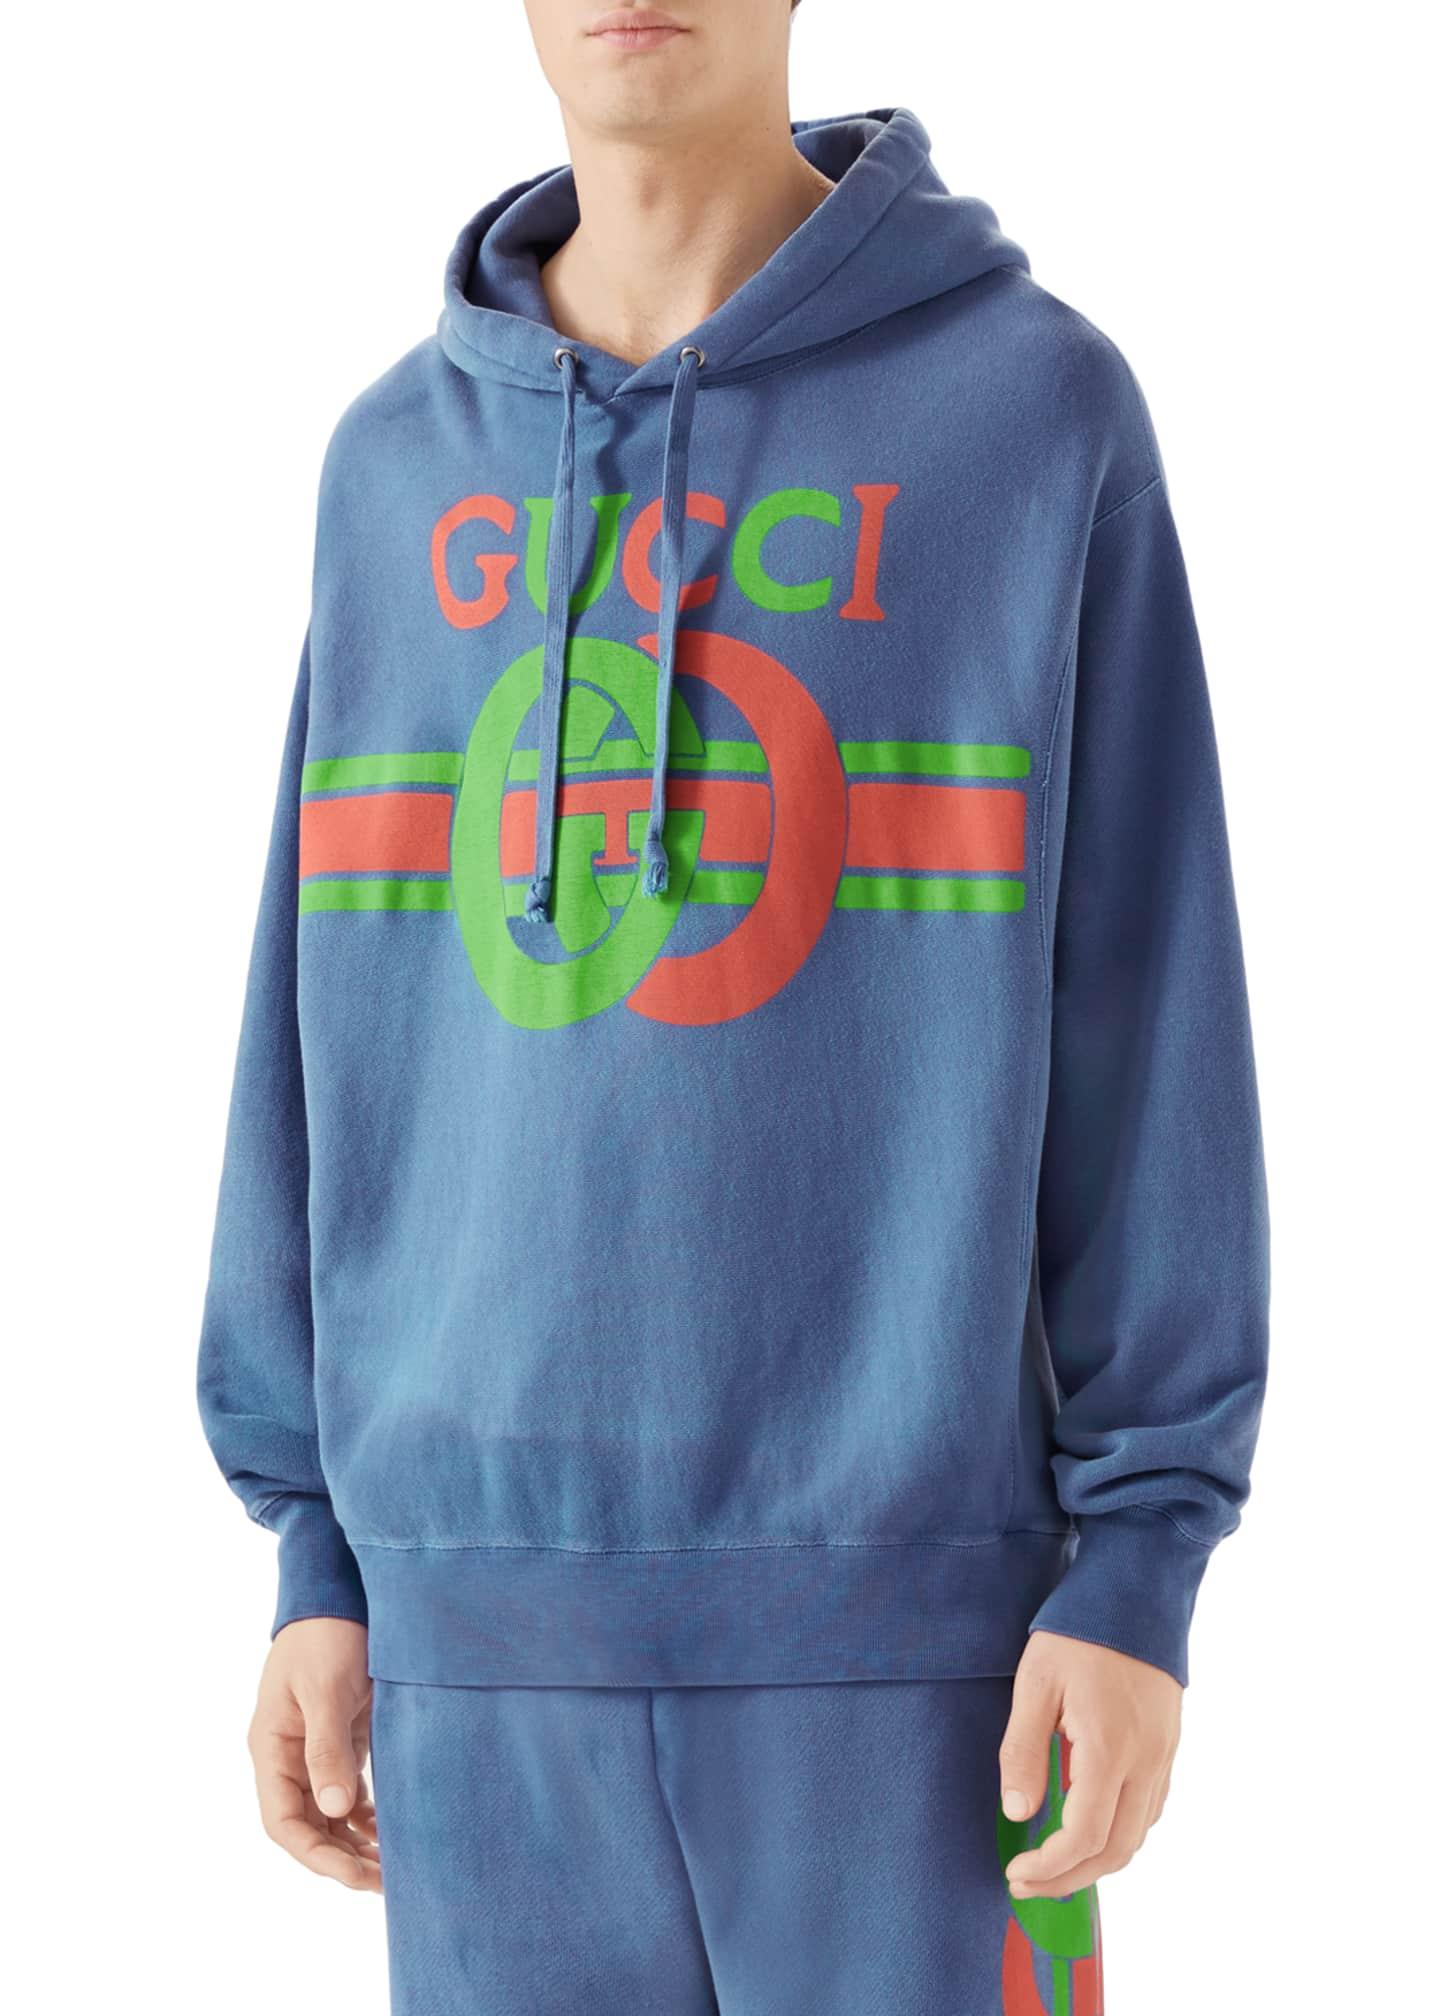 Gucci Men's Striped GG Logo Washed Hoodie Sweatshirt